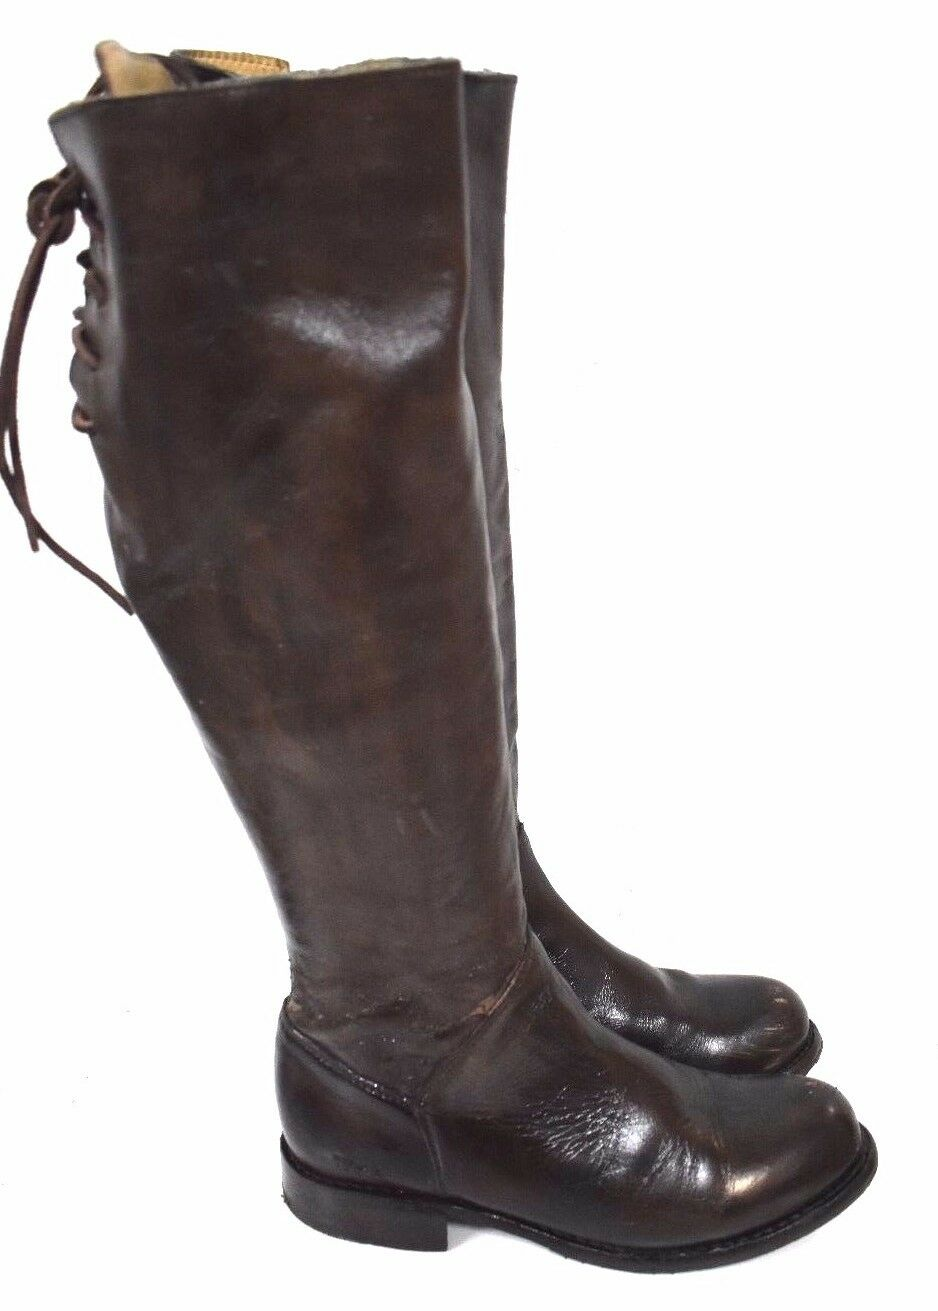 Bed Stu Manchester Teak Glaze Cobbler Series Tall Lace Up Leather Boot Sz 7  2